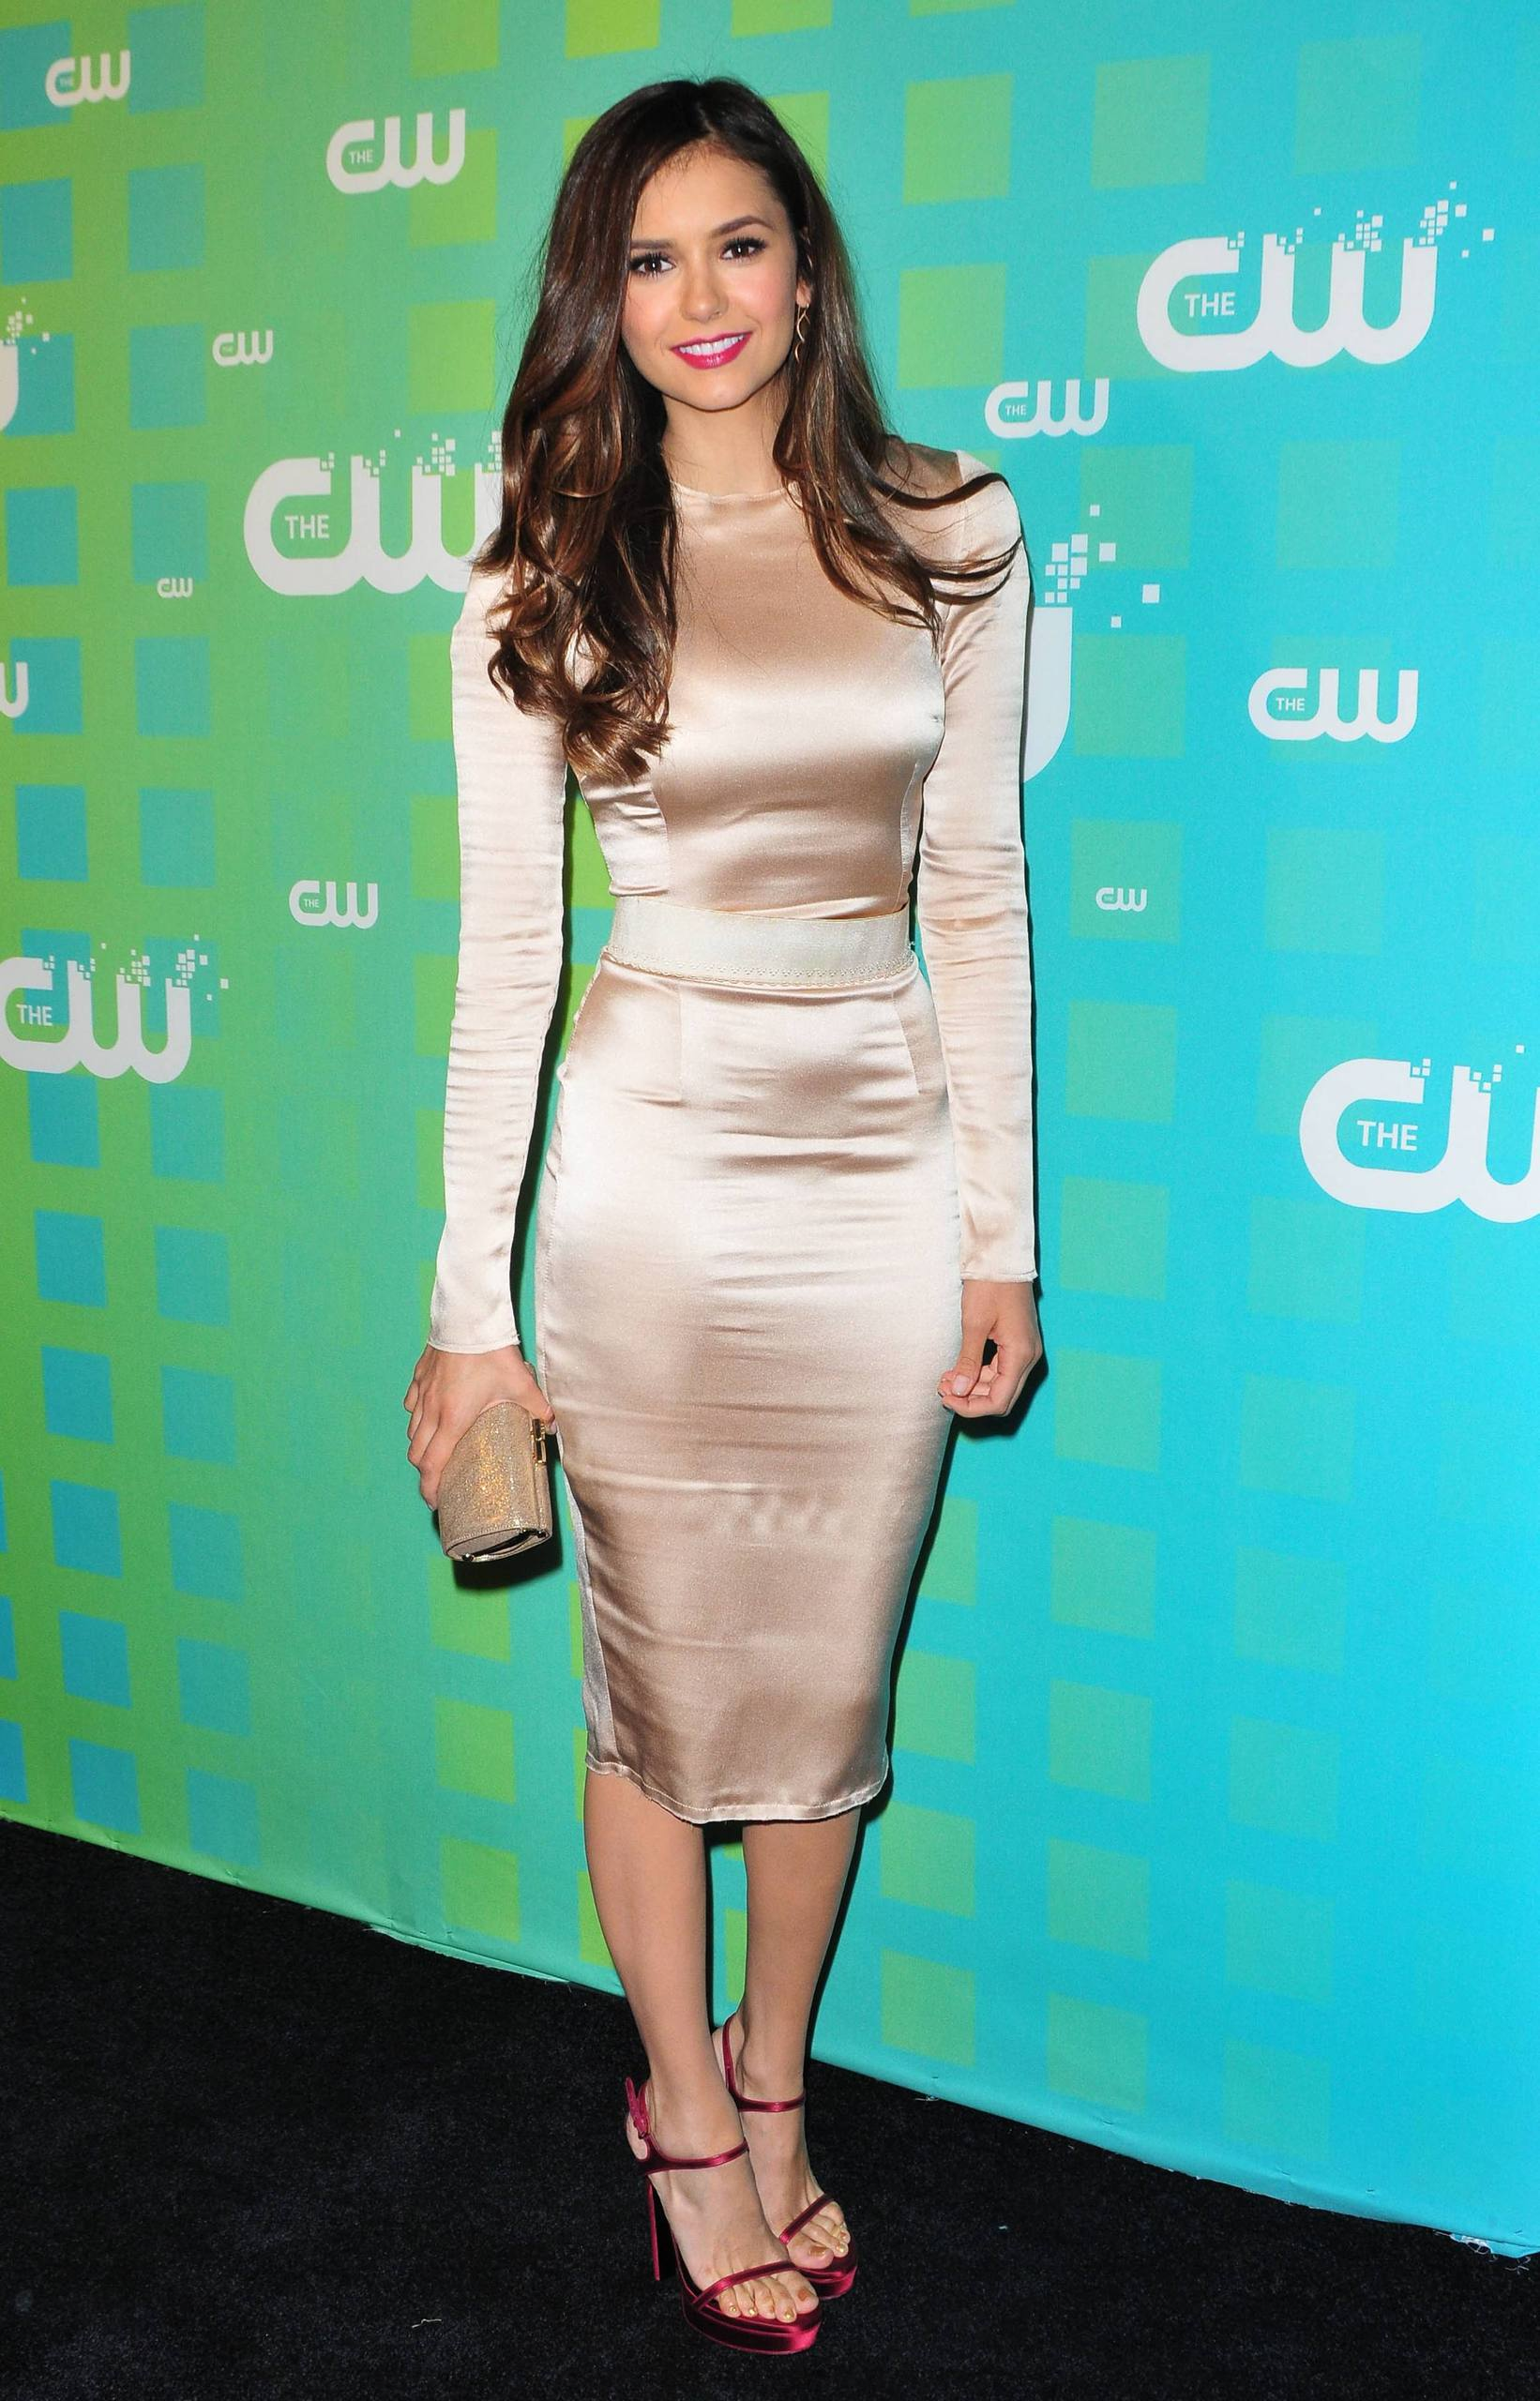 Nina Dobrev at The CW Upfronts